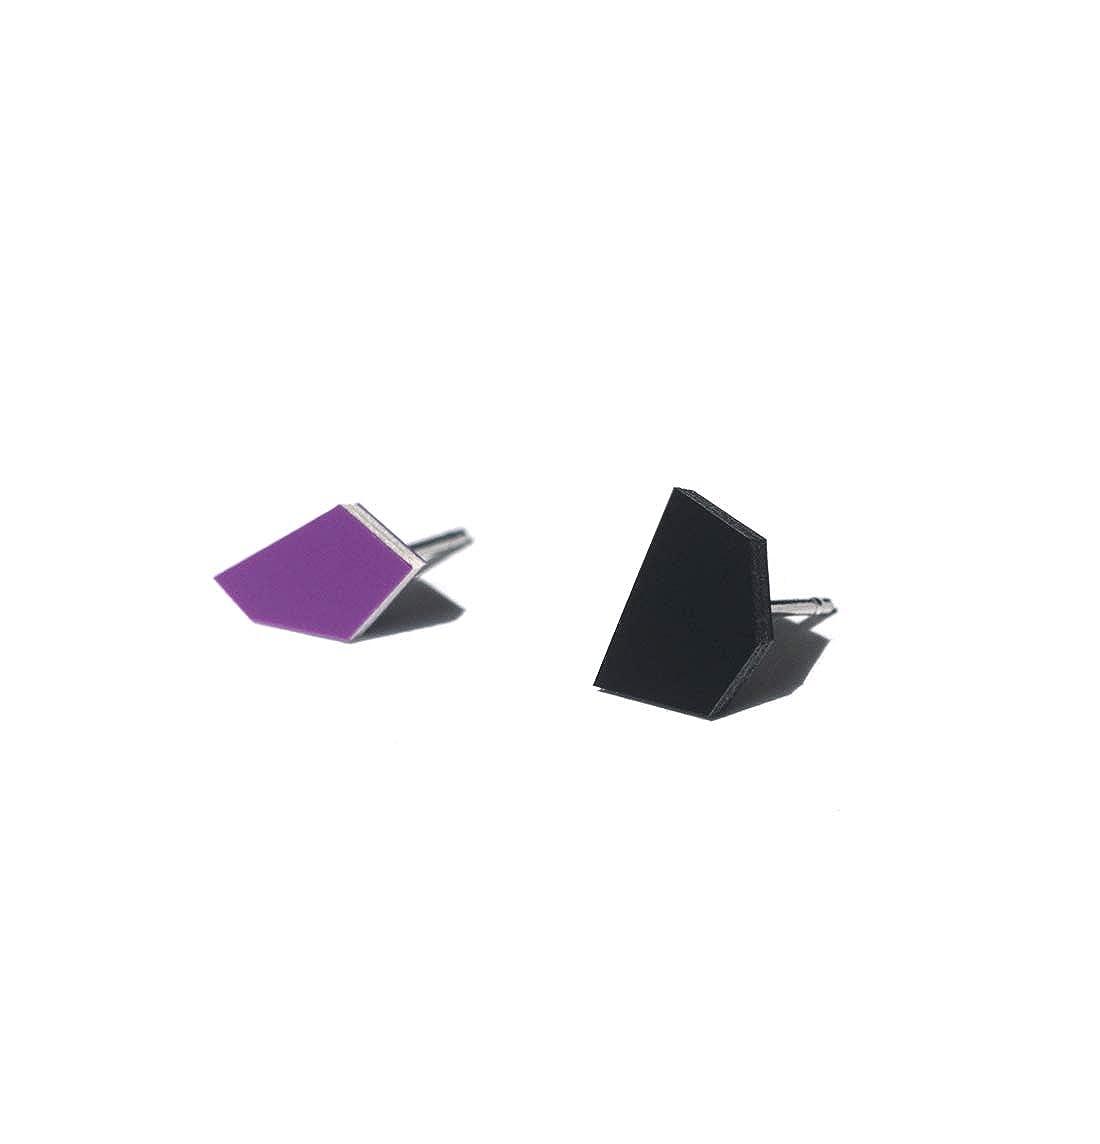 Enamel Leather Earrings in Classic Colors and Irregular Shapes Tiny Stud Earrings Minimalist Earrings